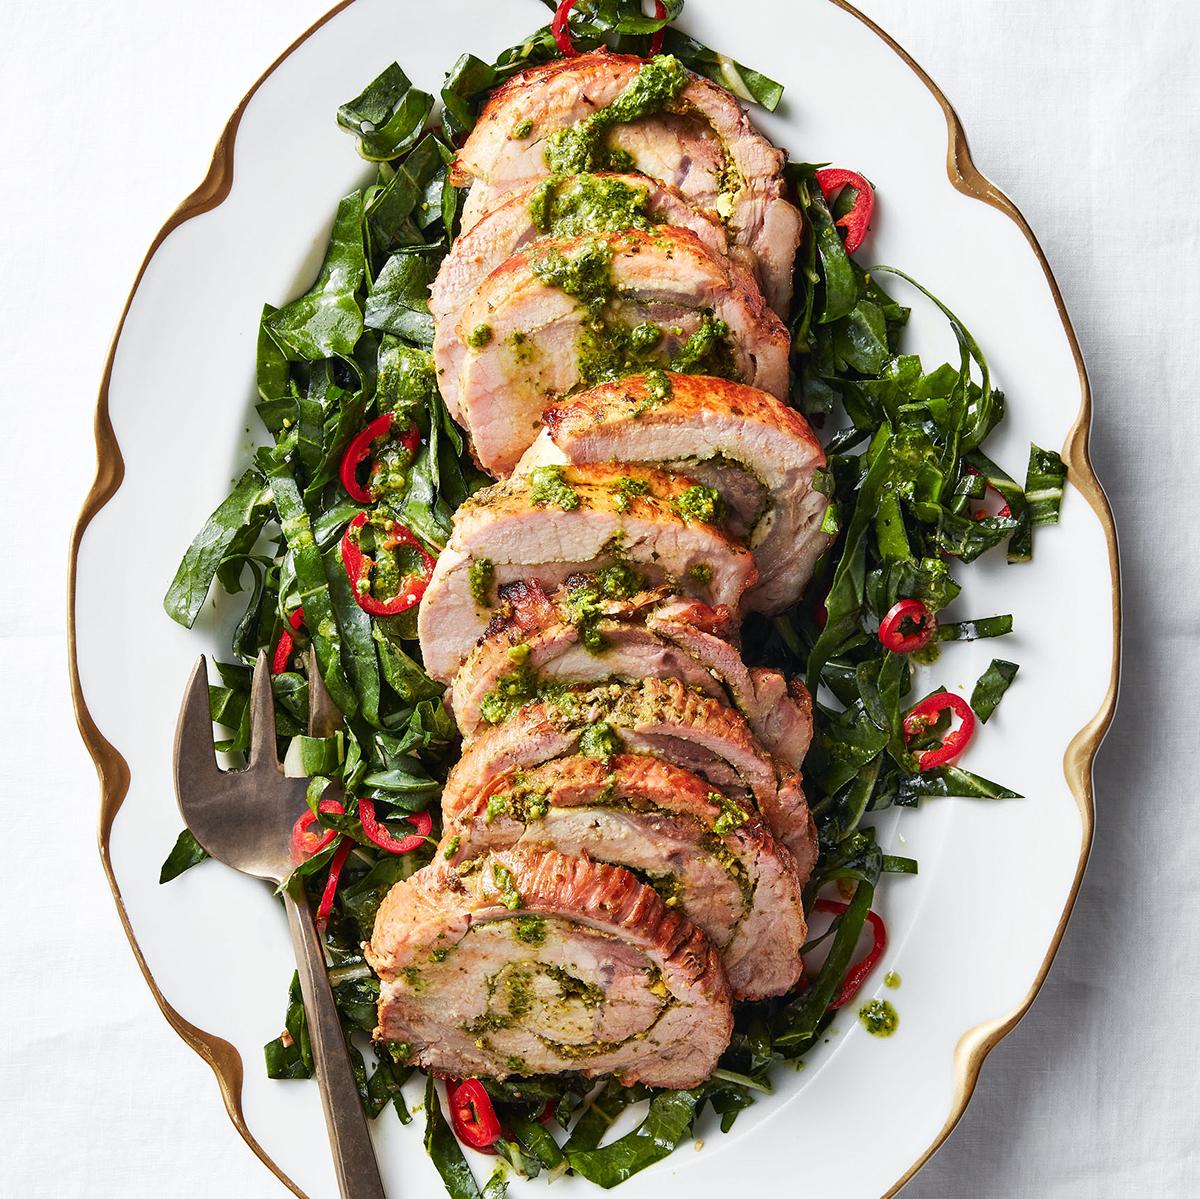 Chard Pesto-Stuffed Pork Loin